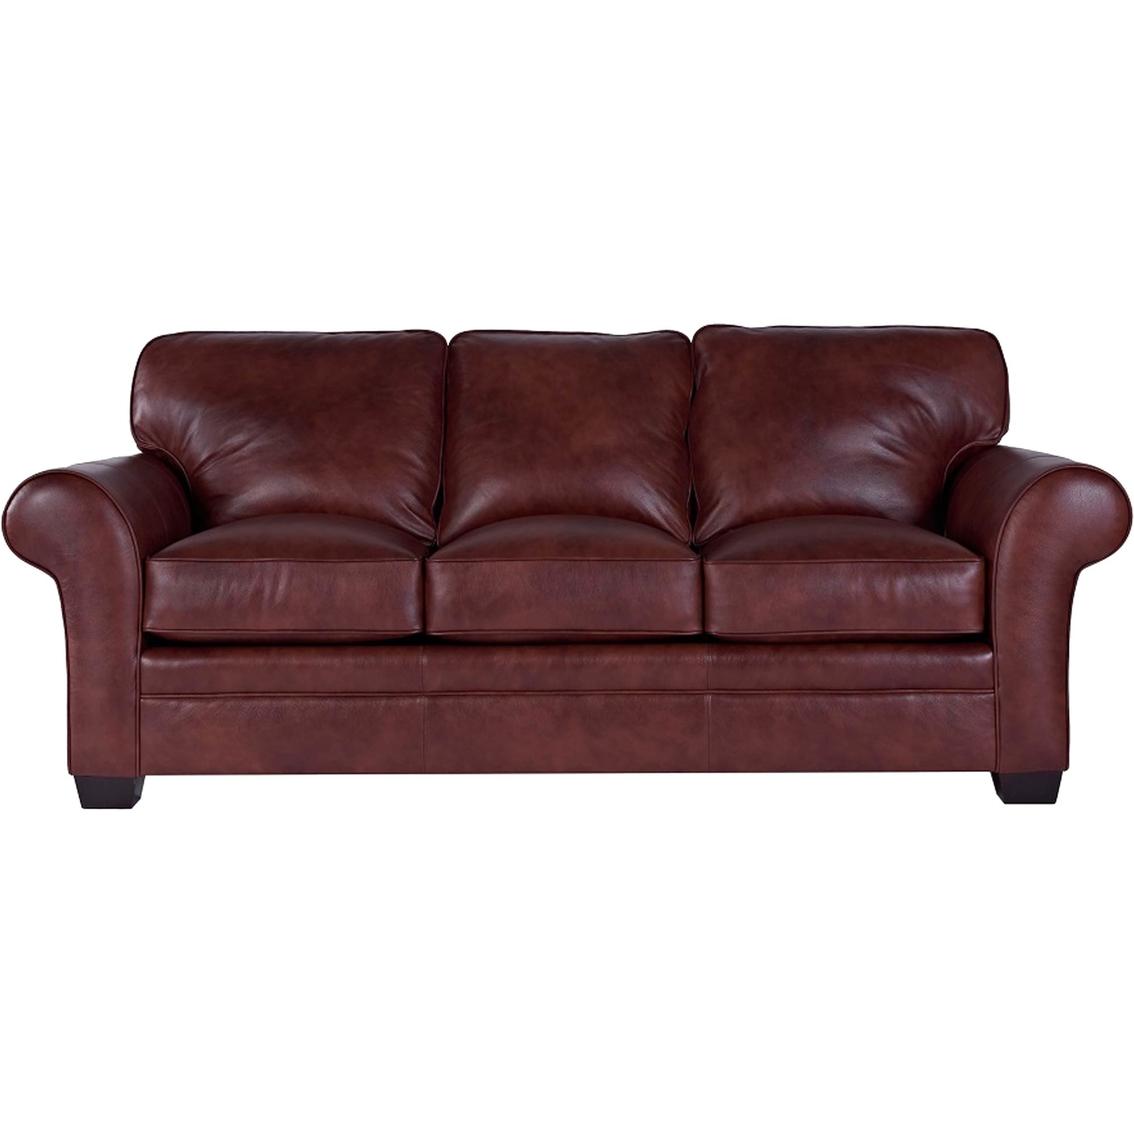 Broyhill Zachary Leather Queen Sofa Sleeper